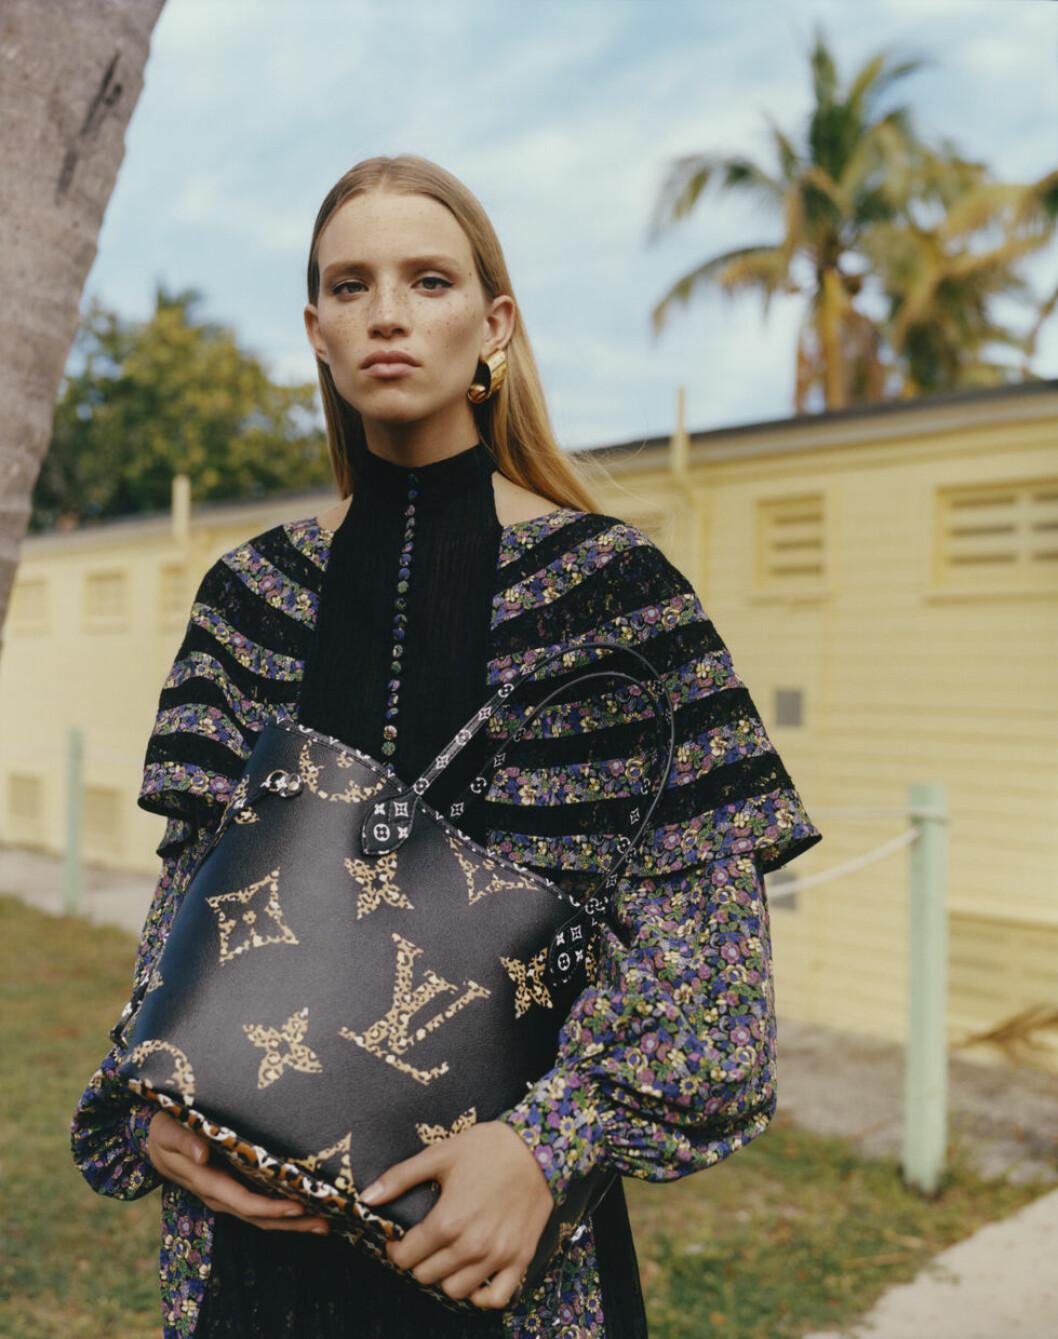 Louis Vuitton Monogram Giant Jungle neverfull bag